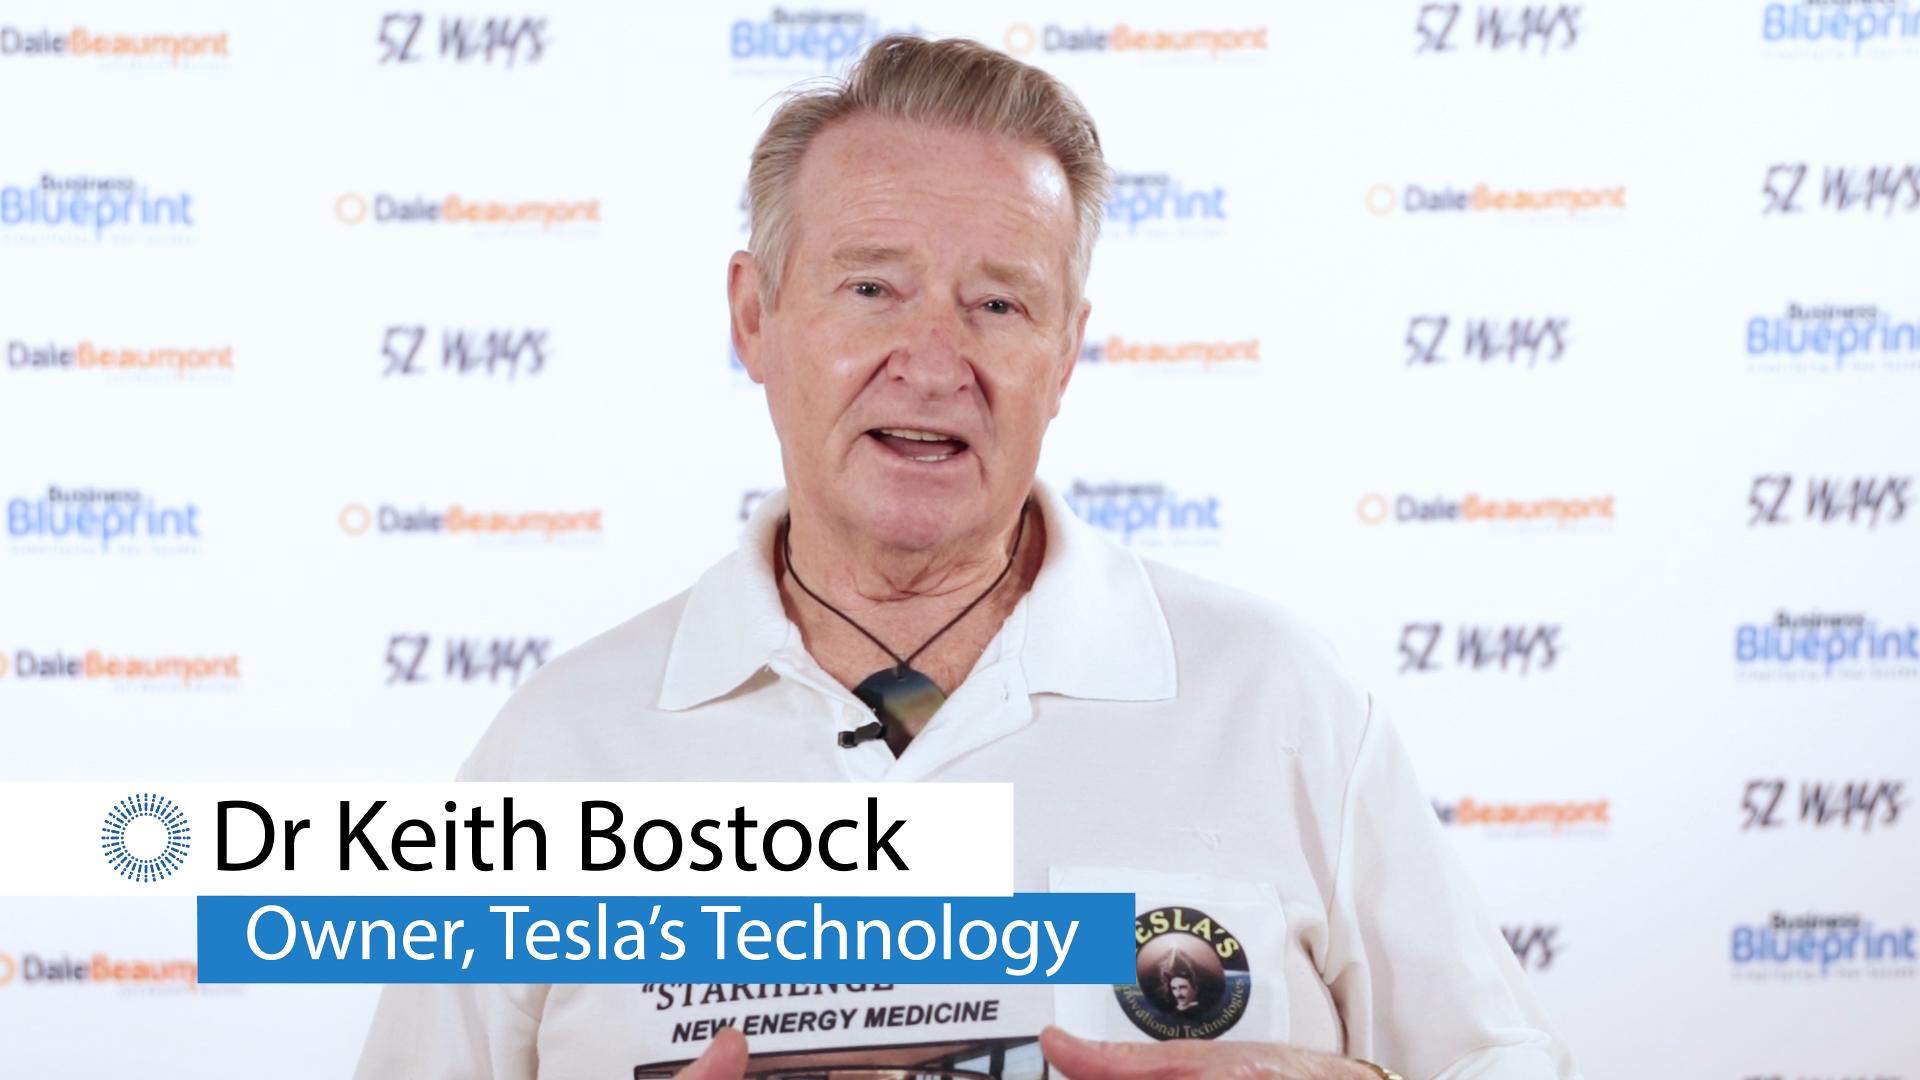 Dr Keith Bostock Winners Wall video.mp4.